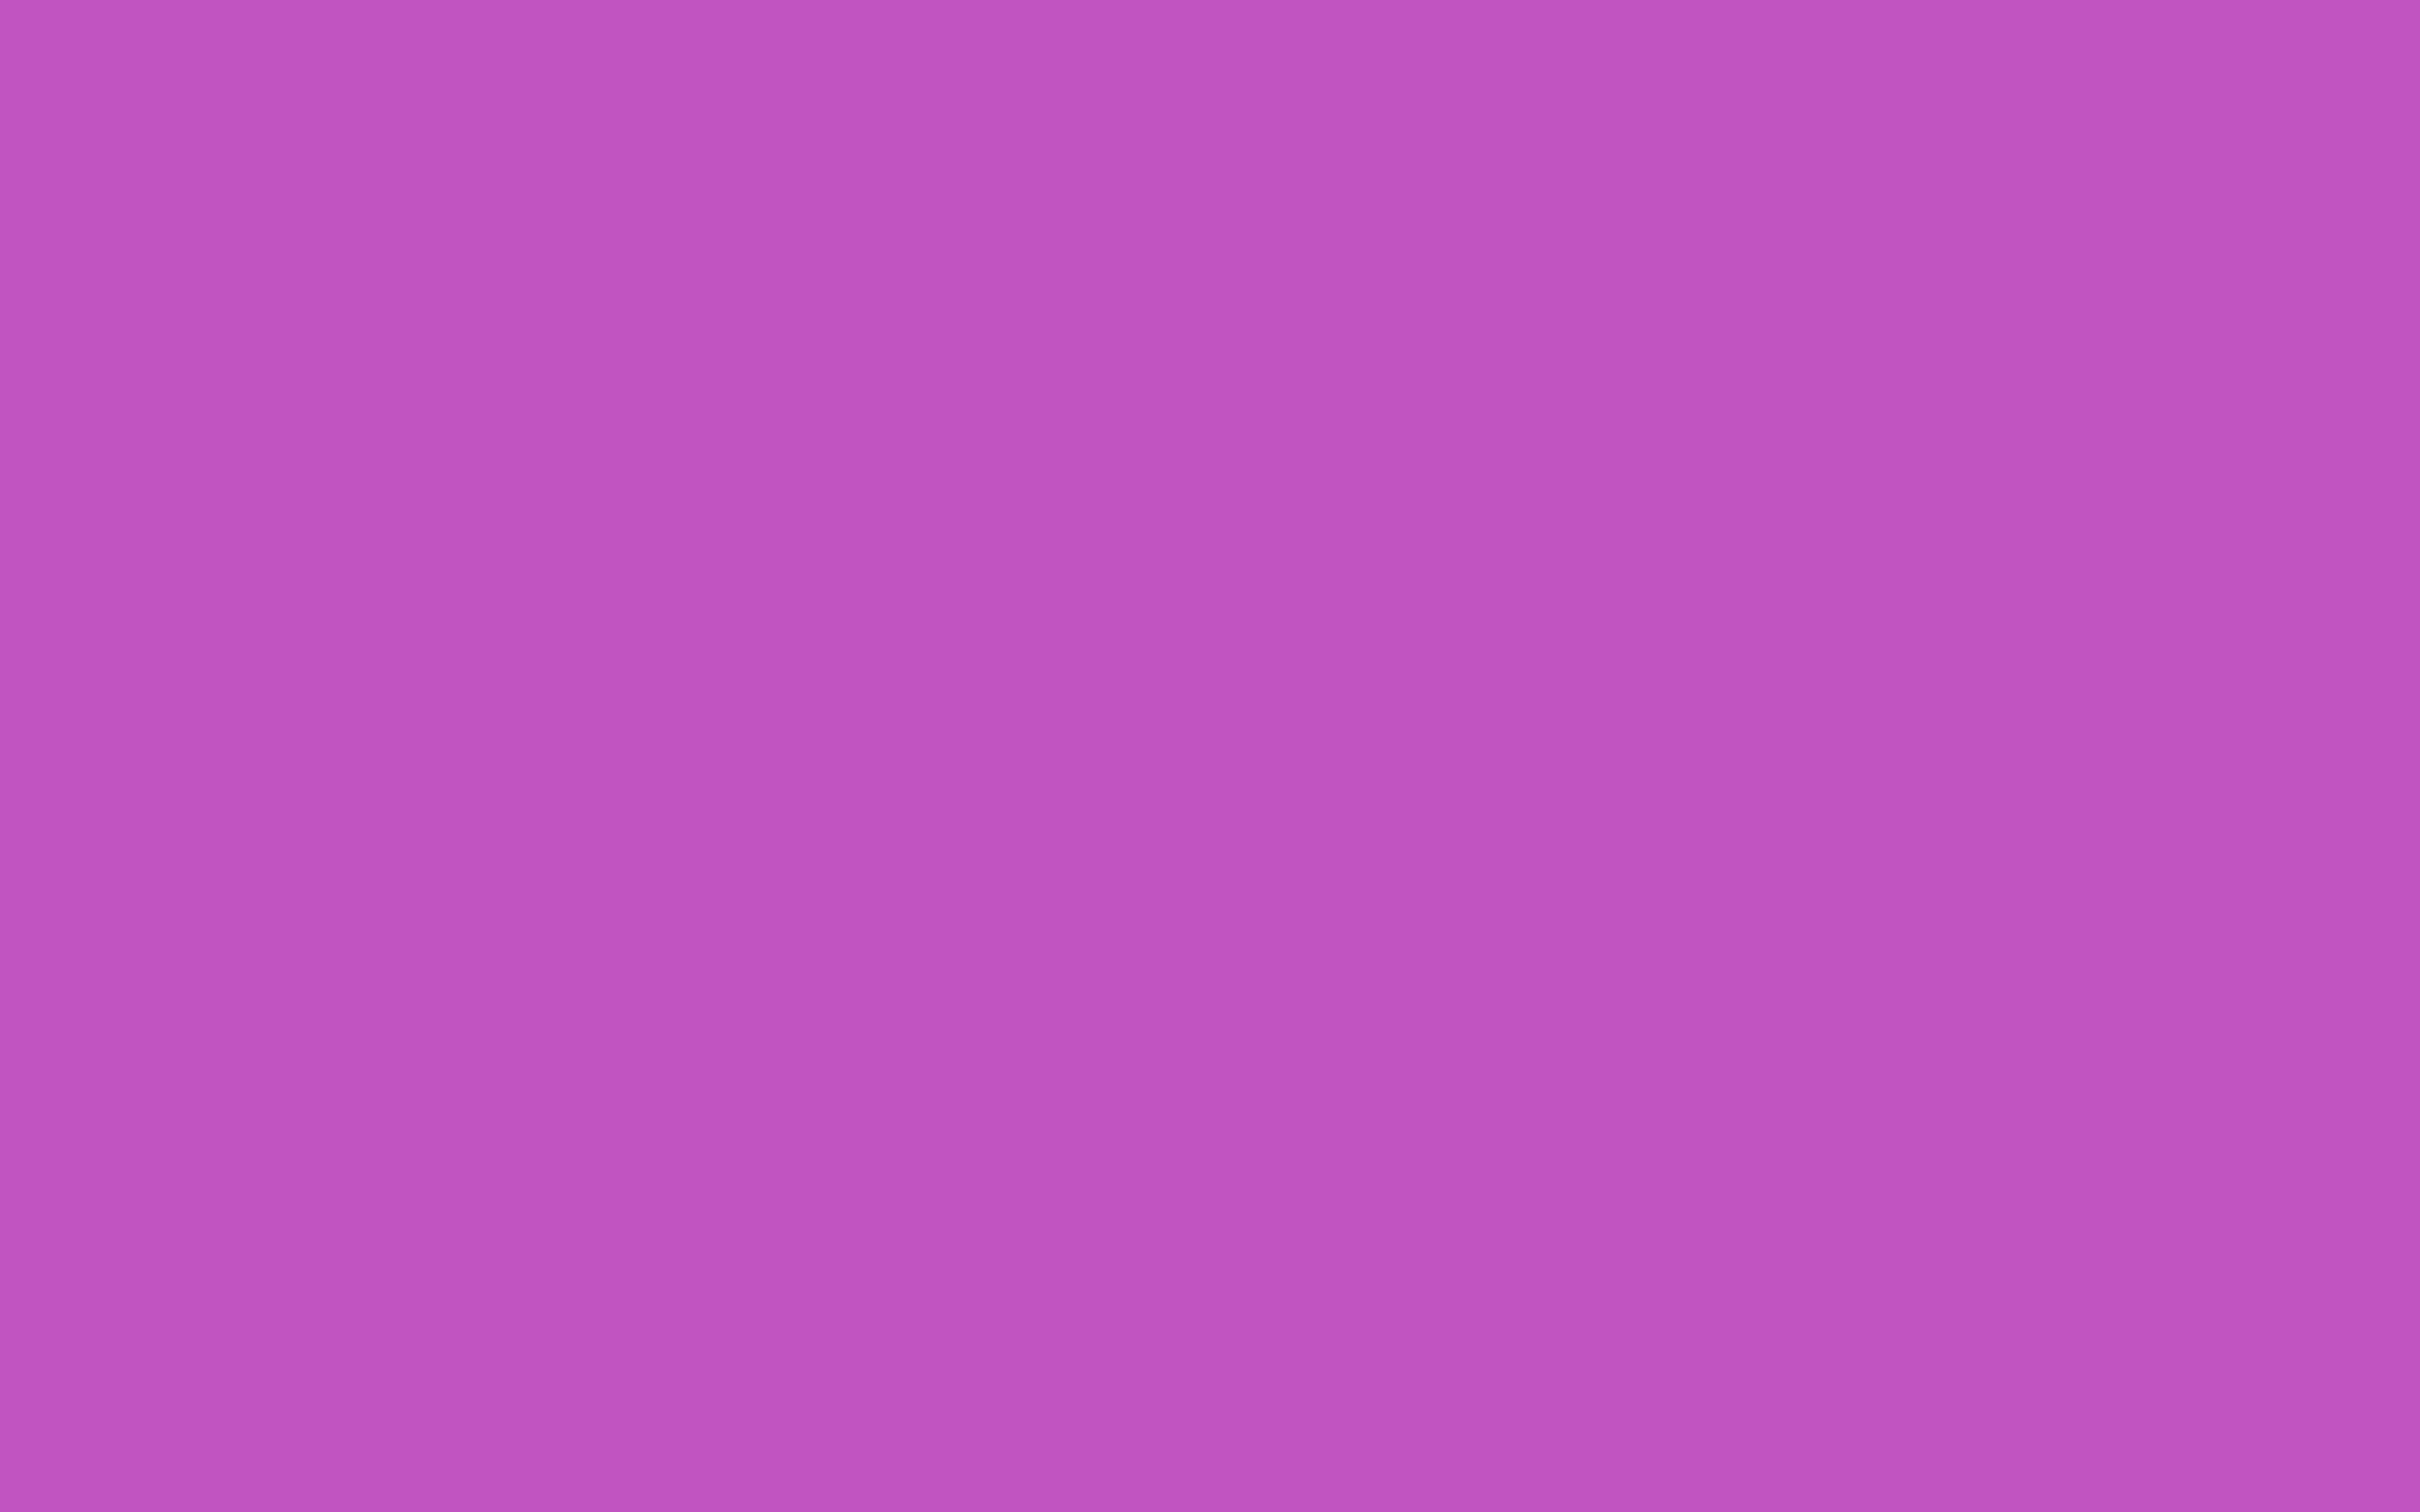 2560x1600 Fuchsia Crayola Solid Color Background